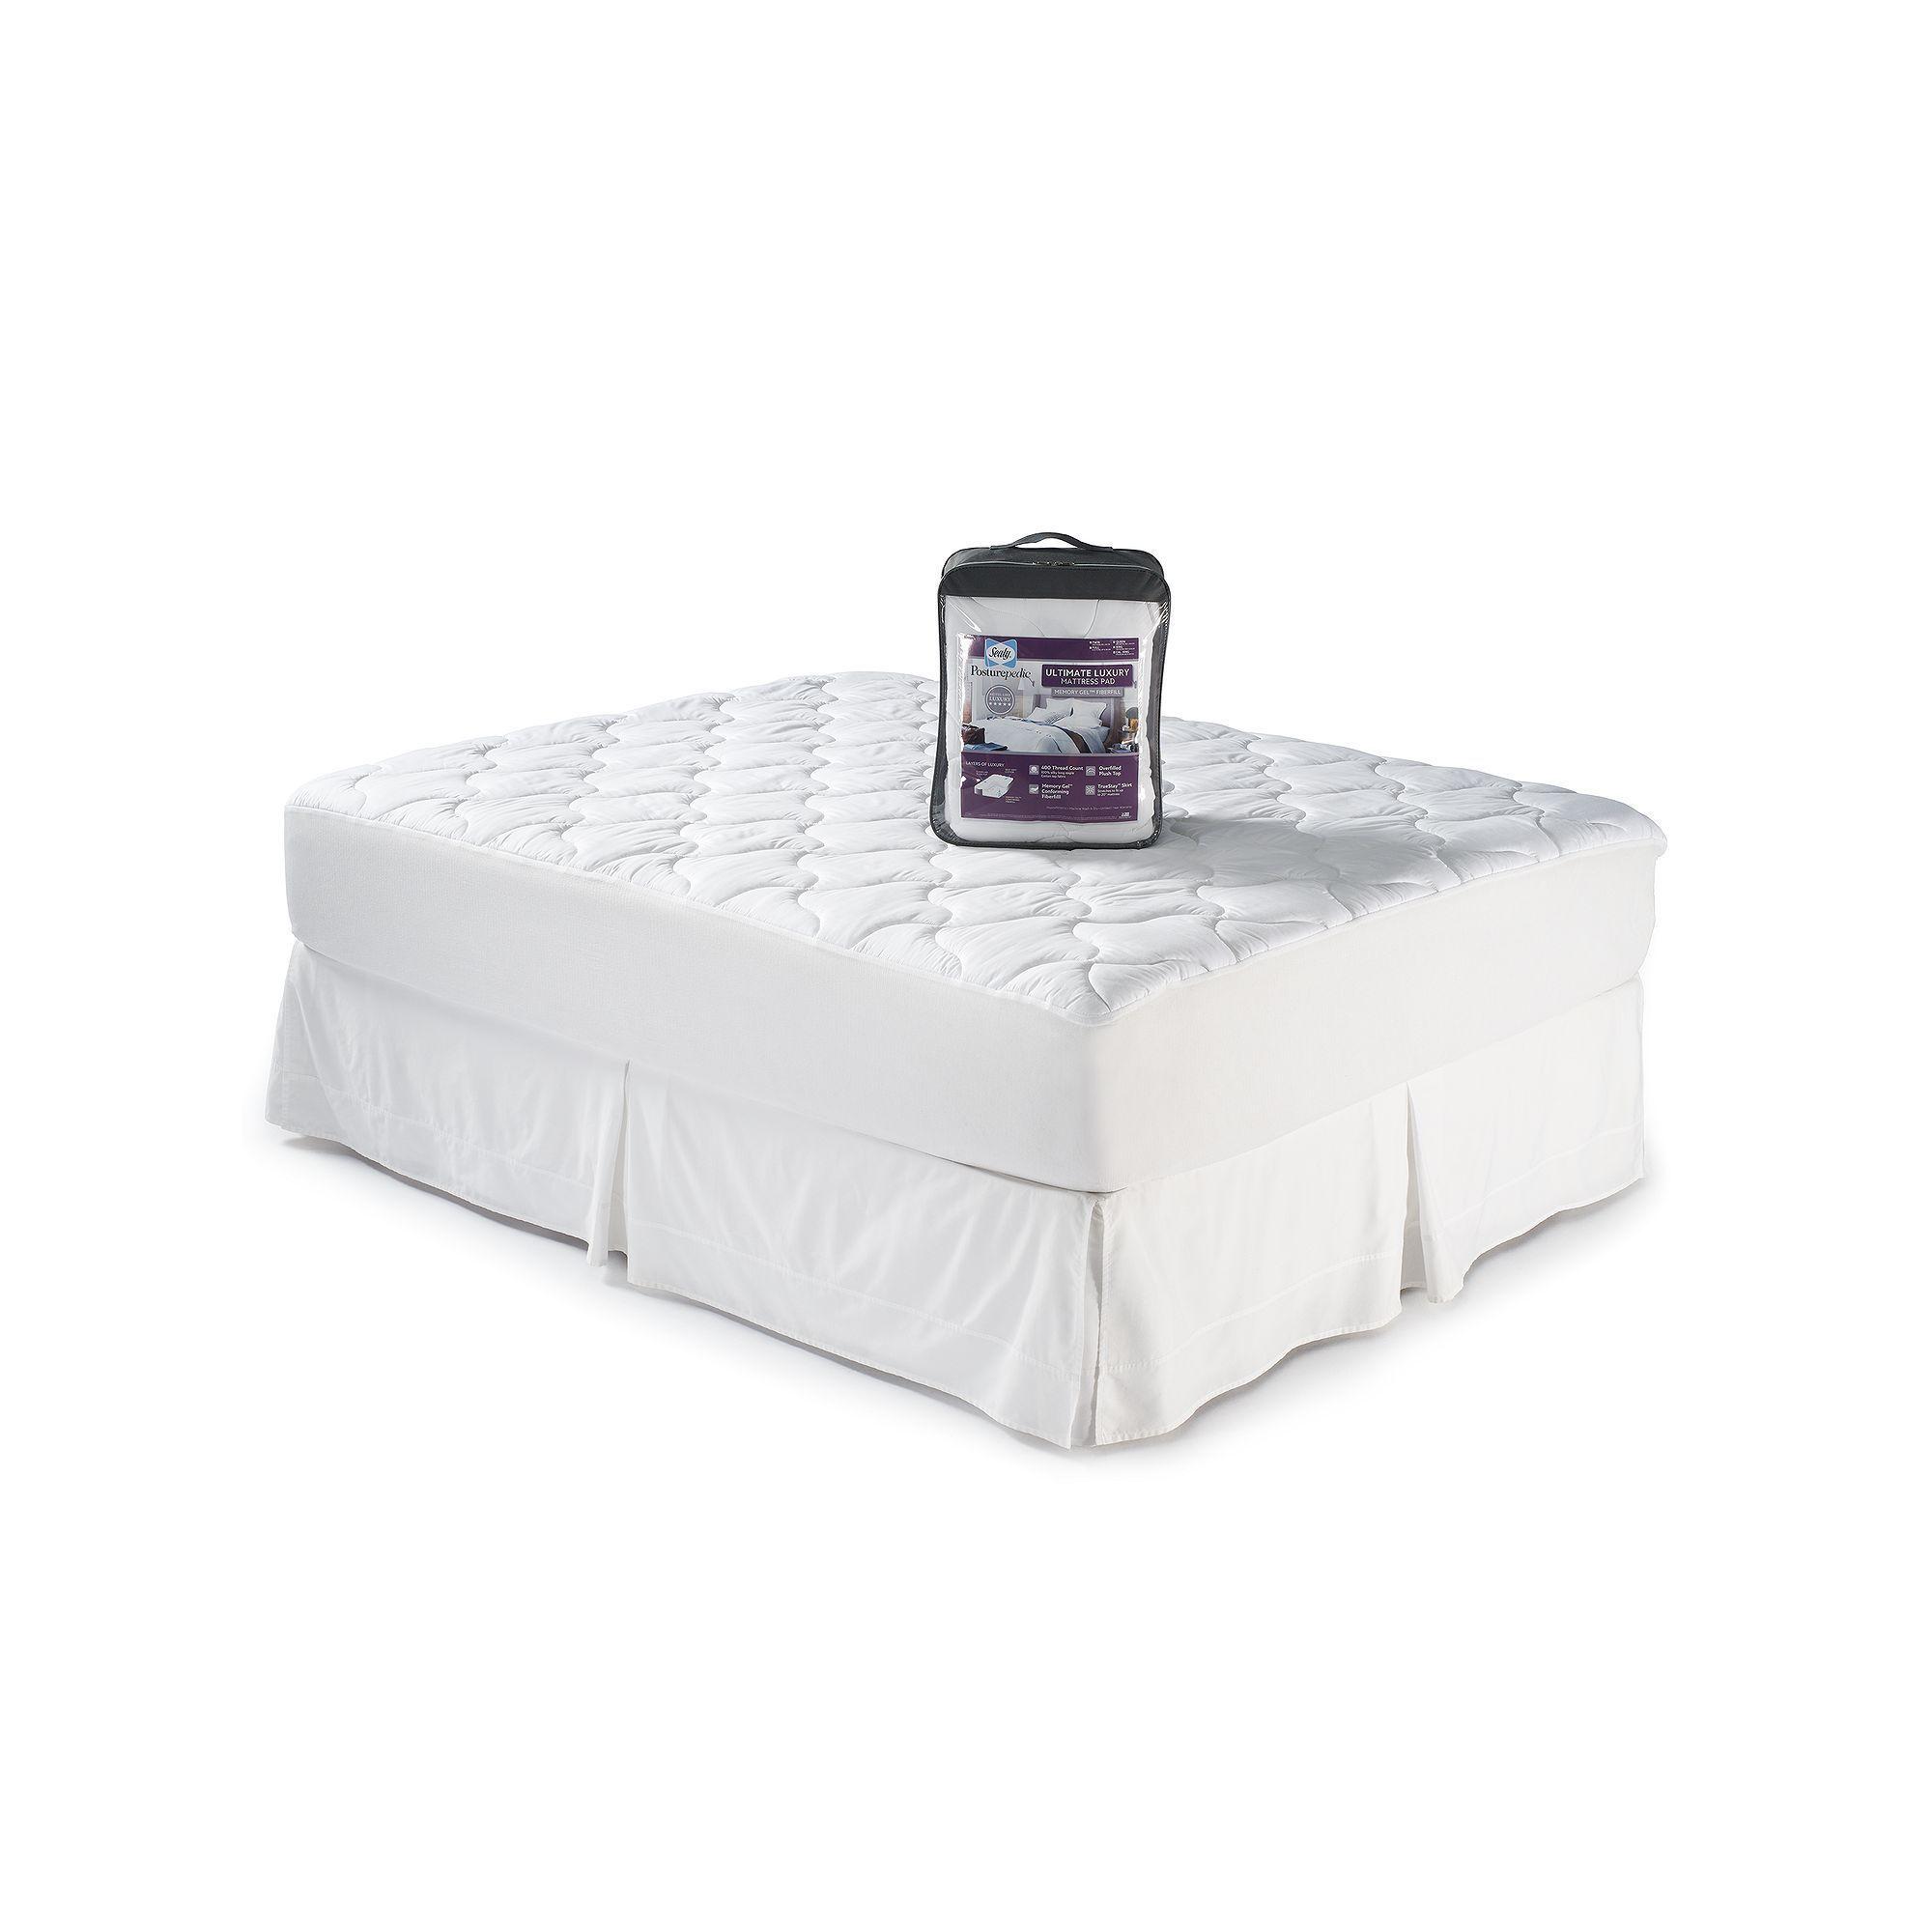 Sealy Posturepedic 400 Thread Count Luxury Mattress Pad ...